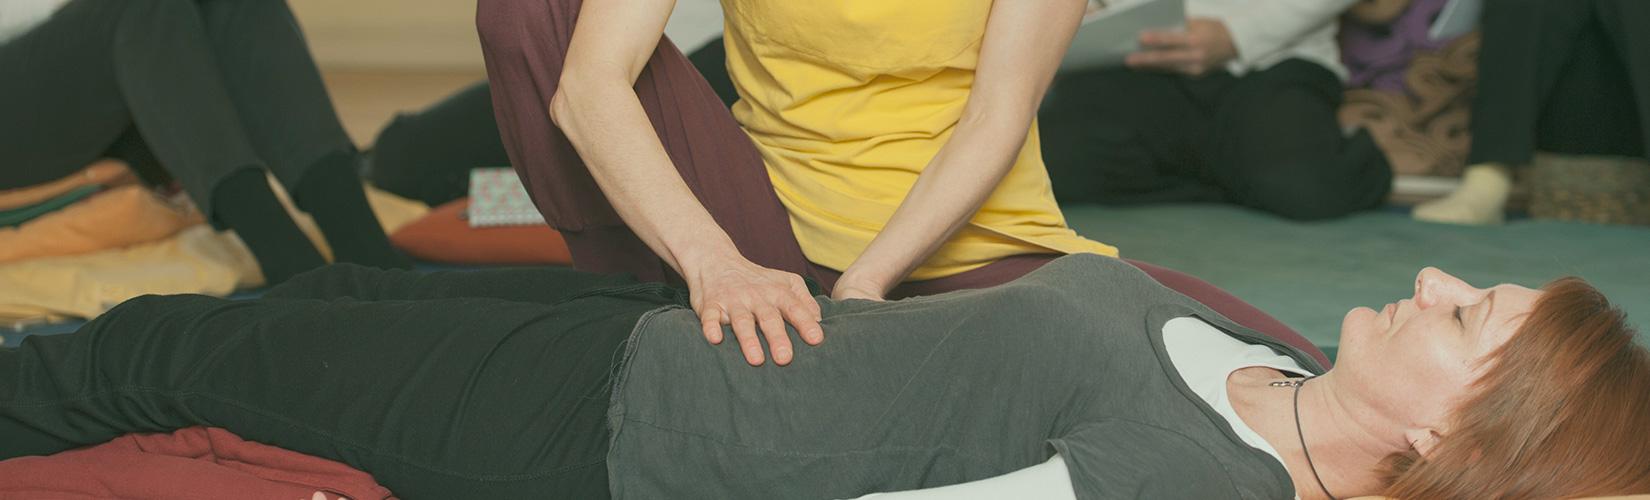 shiatsu treatment floor hands stomach